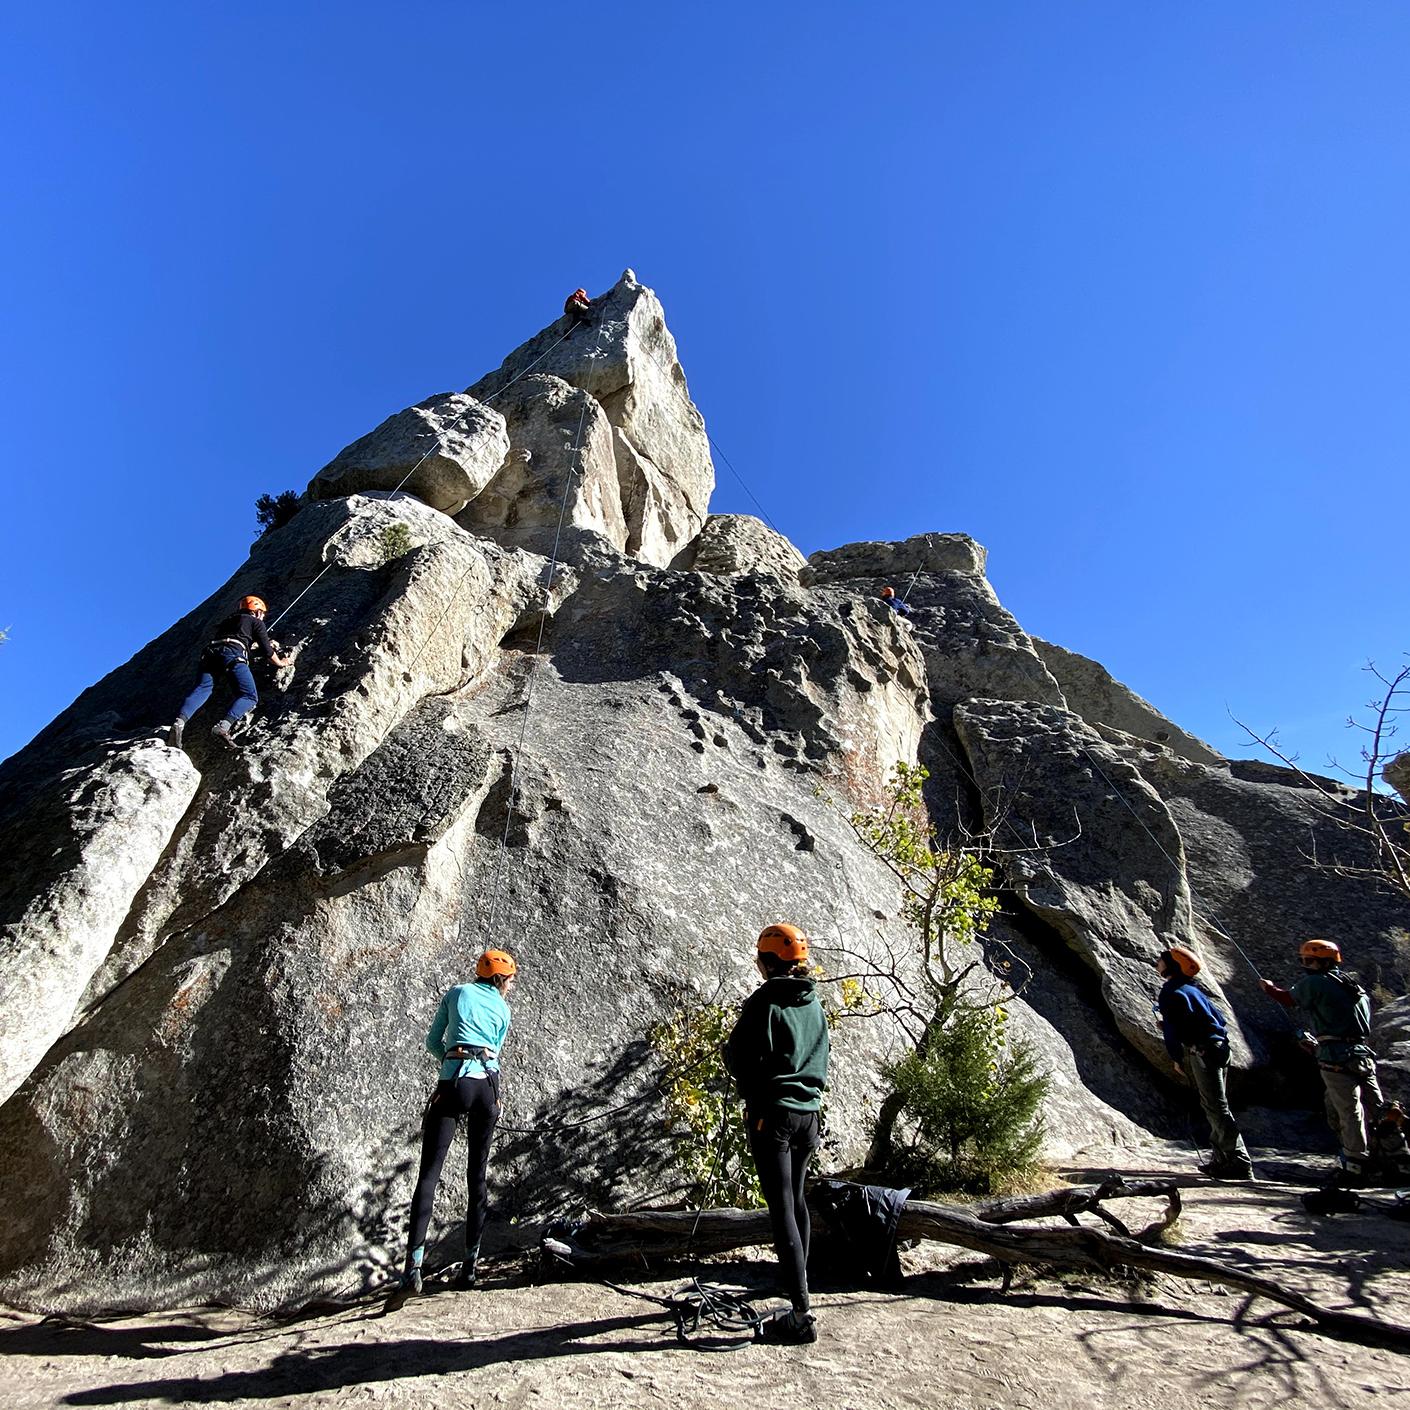 Students rock climbing